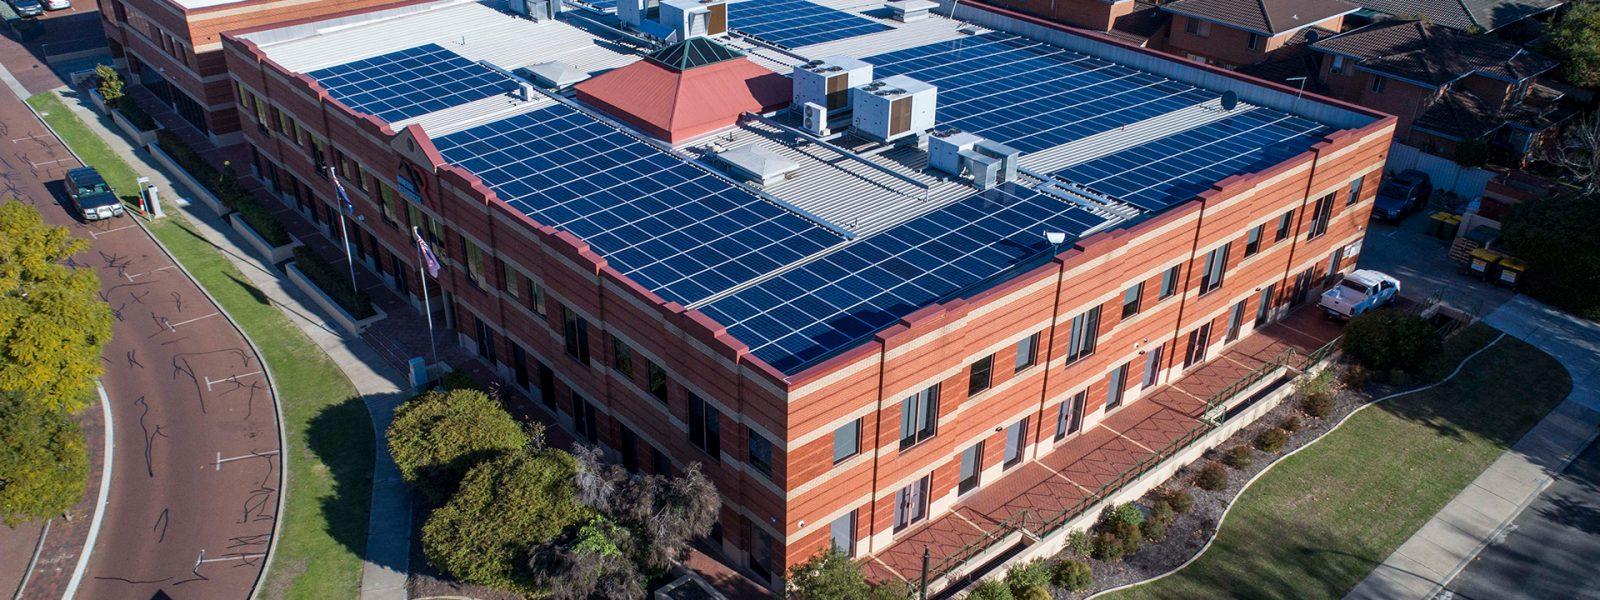 Solar-panels_Sleat-Road-Applecross1